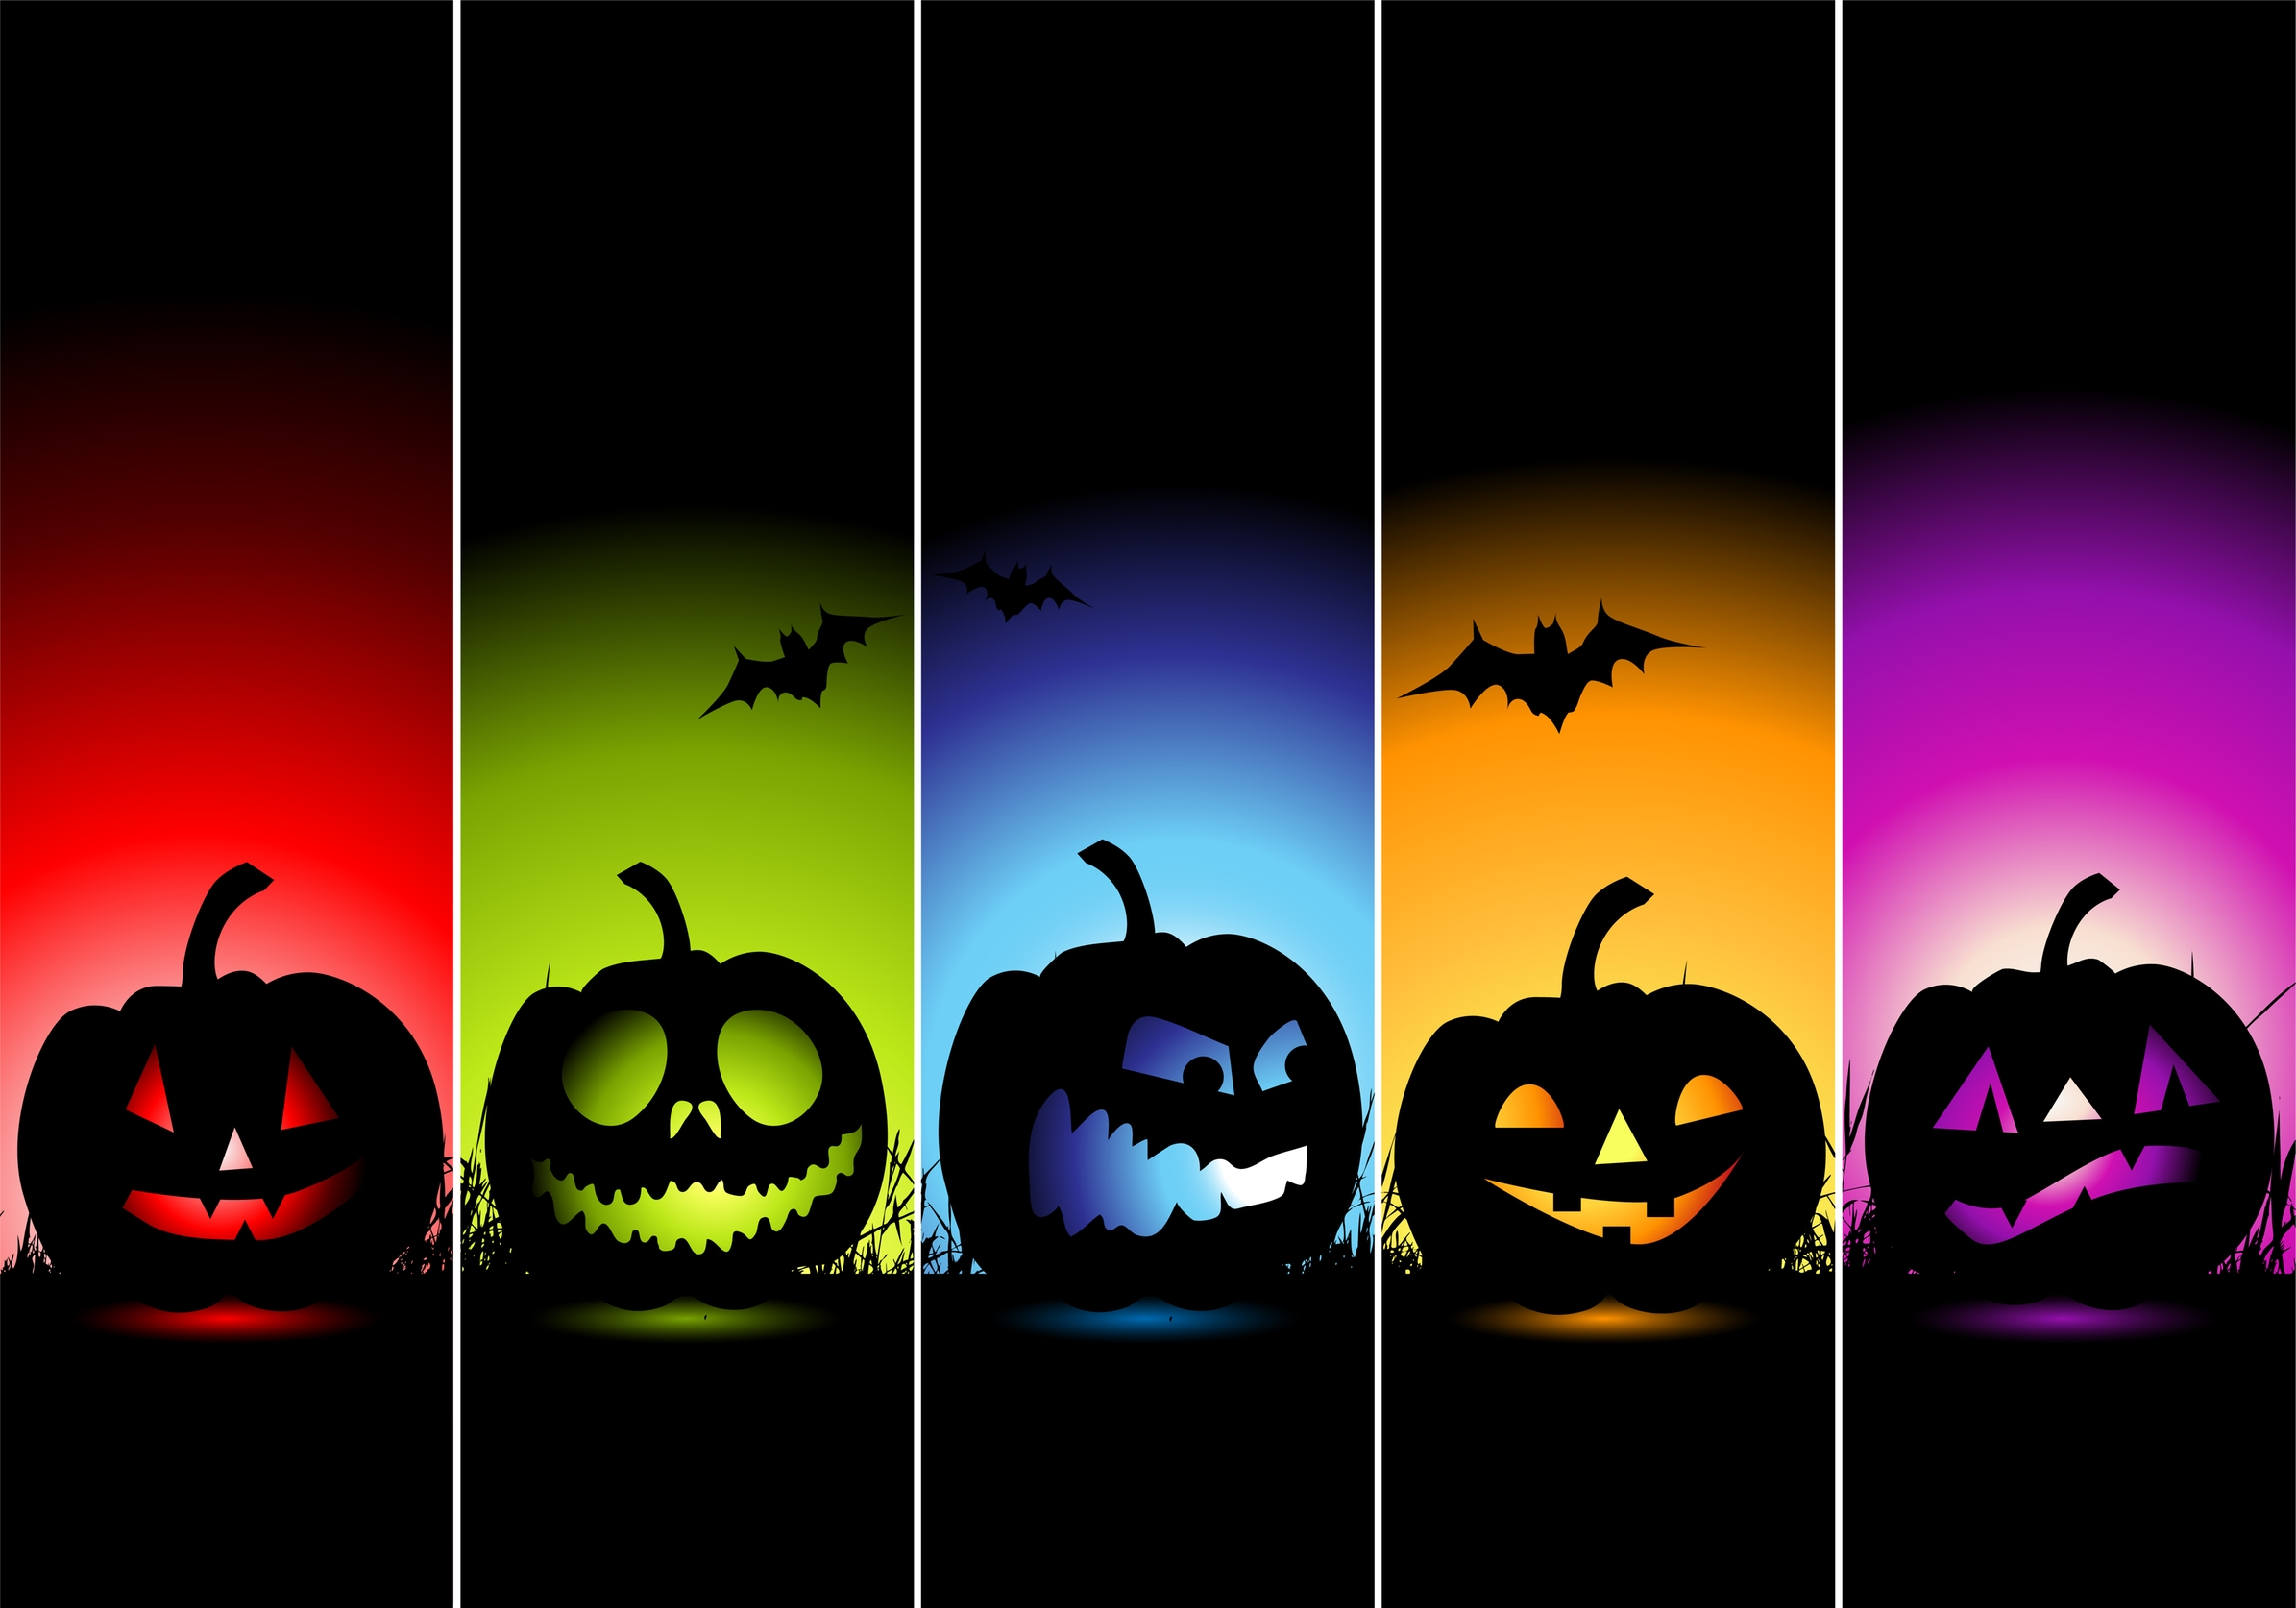 fondos halloween wallpapers gratis - photo #8